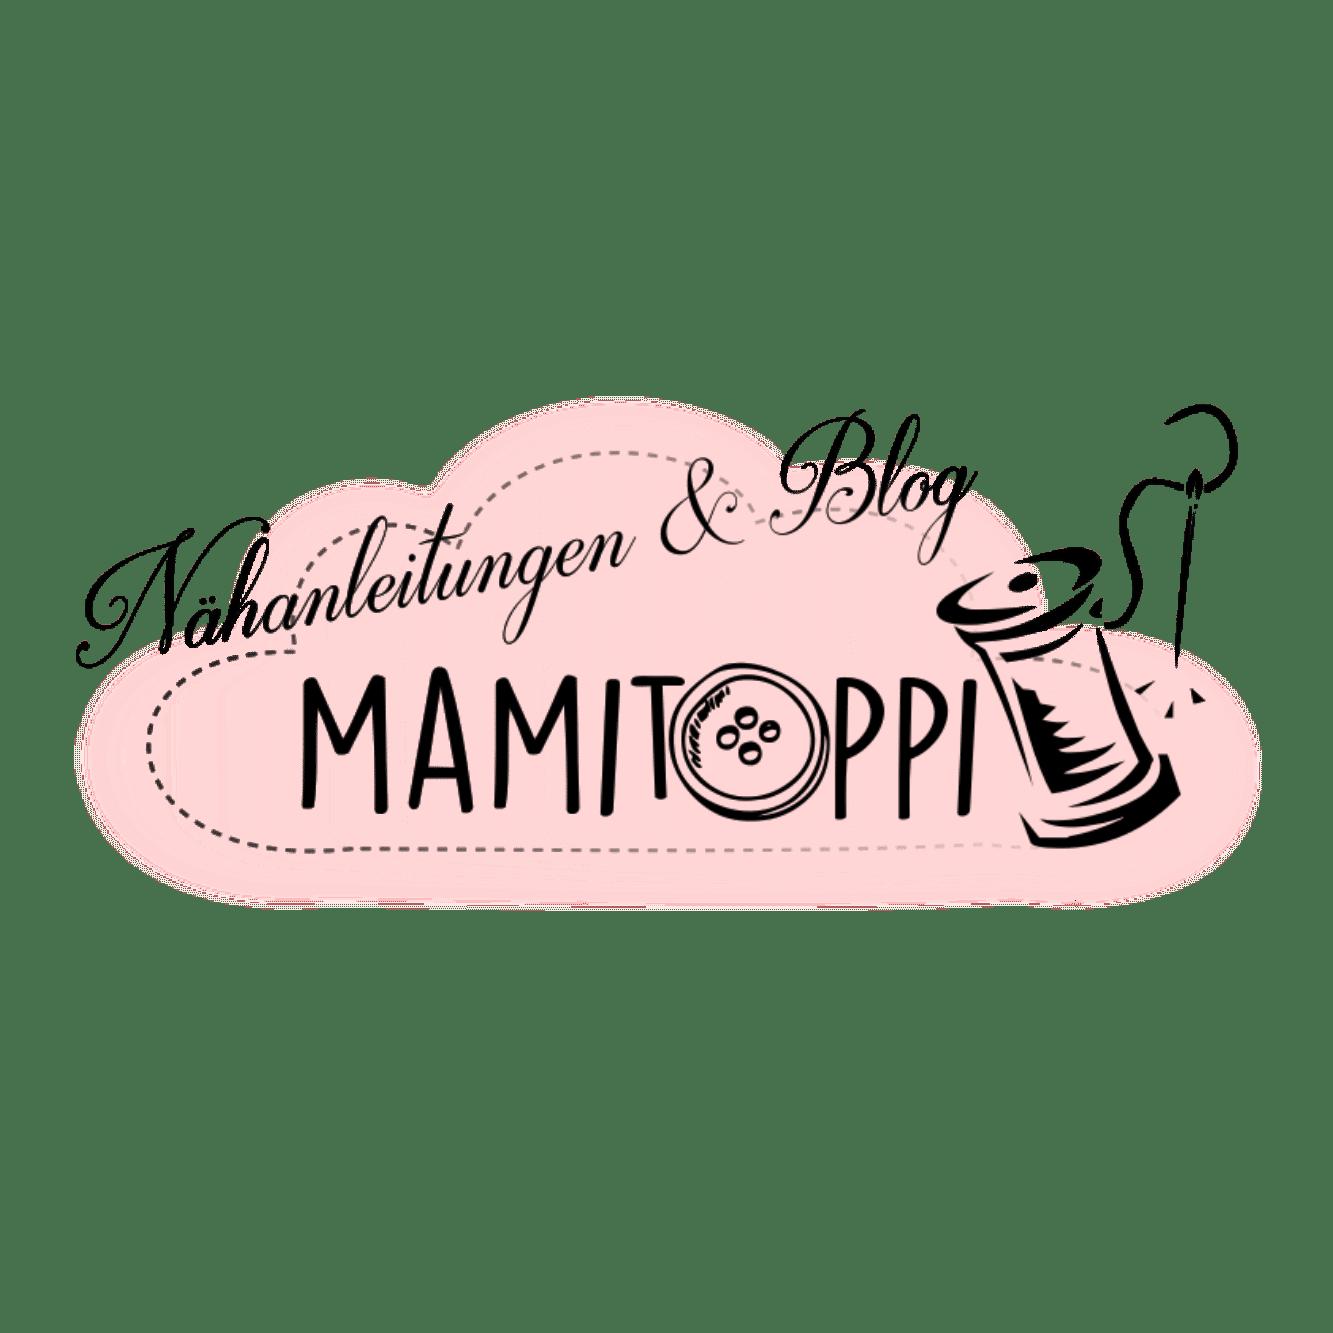 Mamitoppi